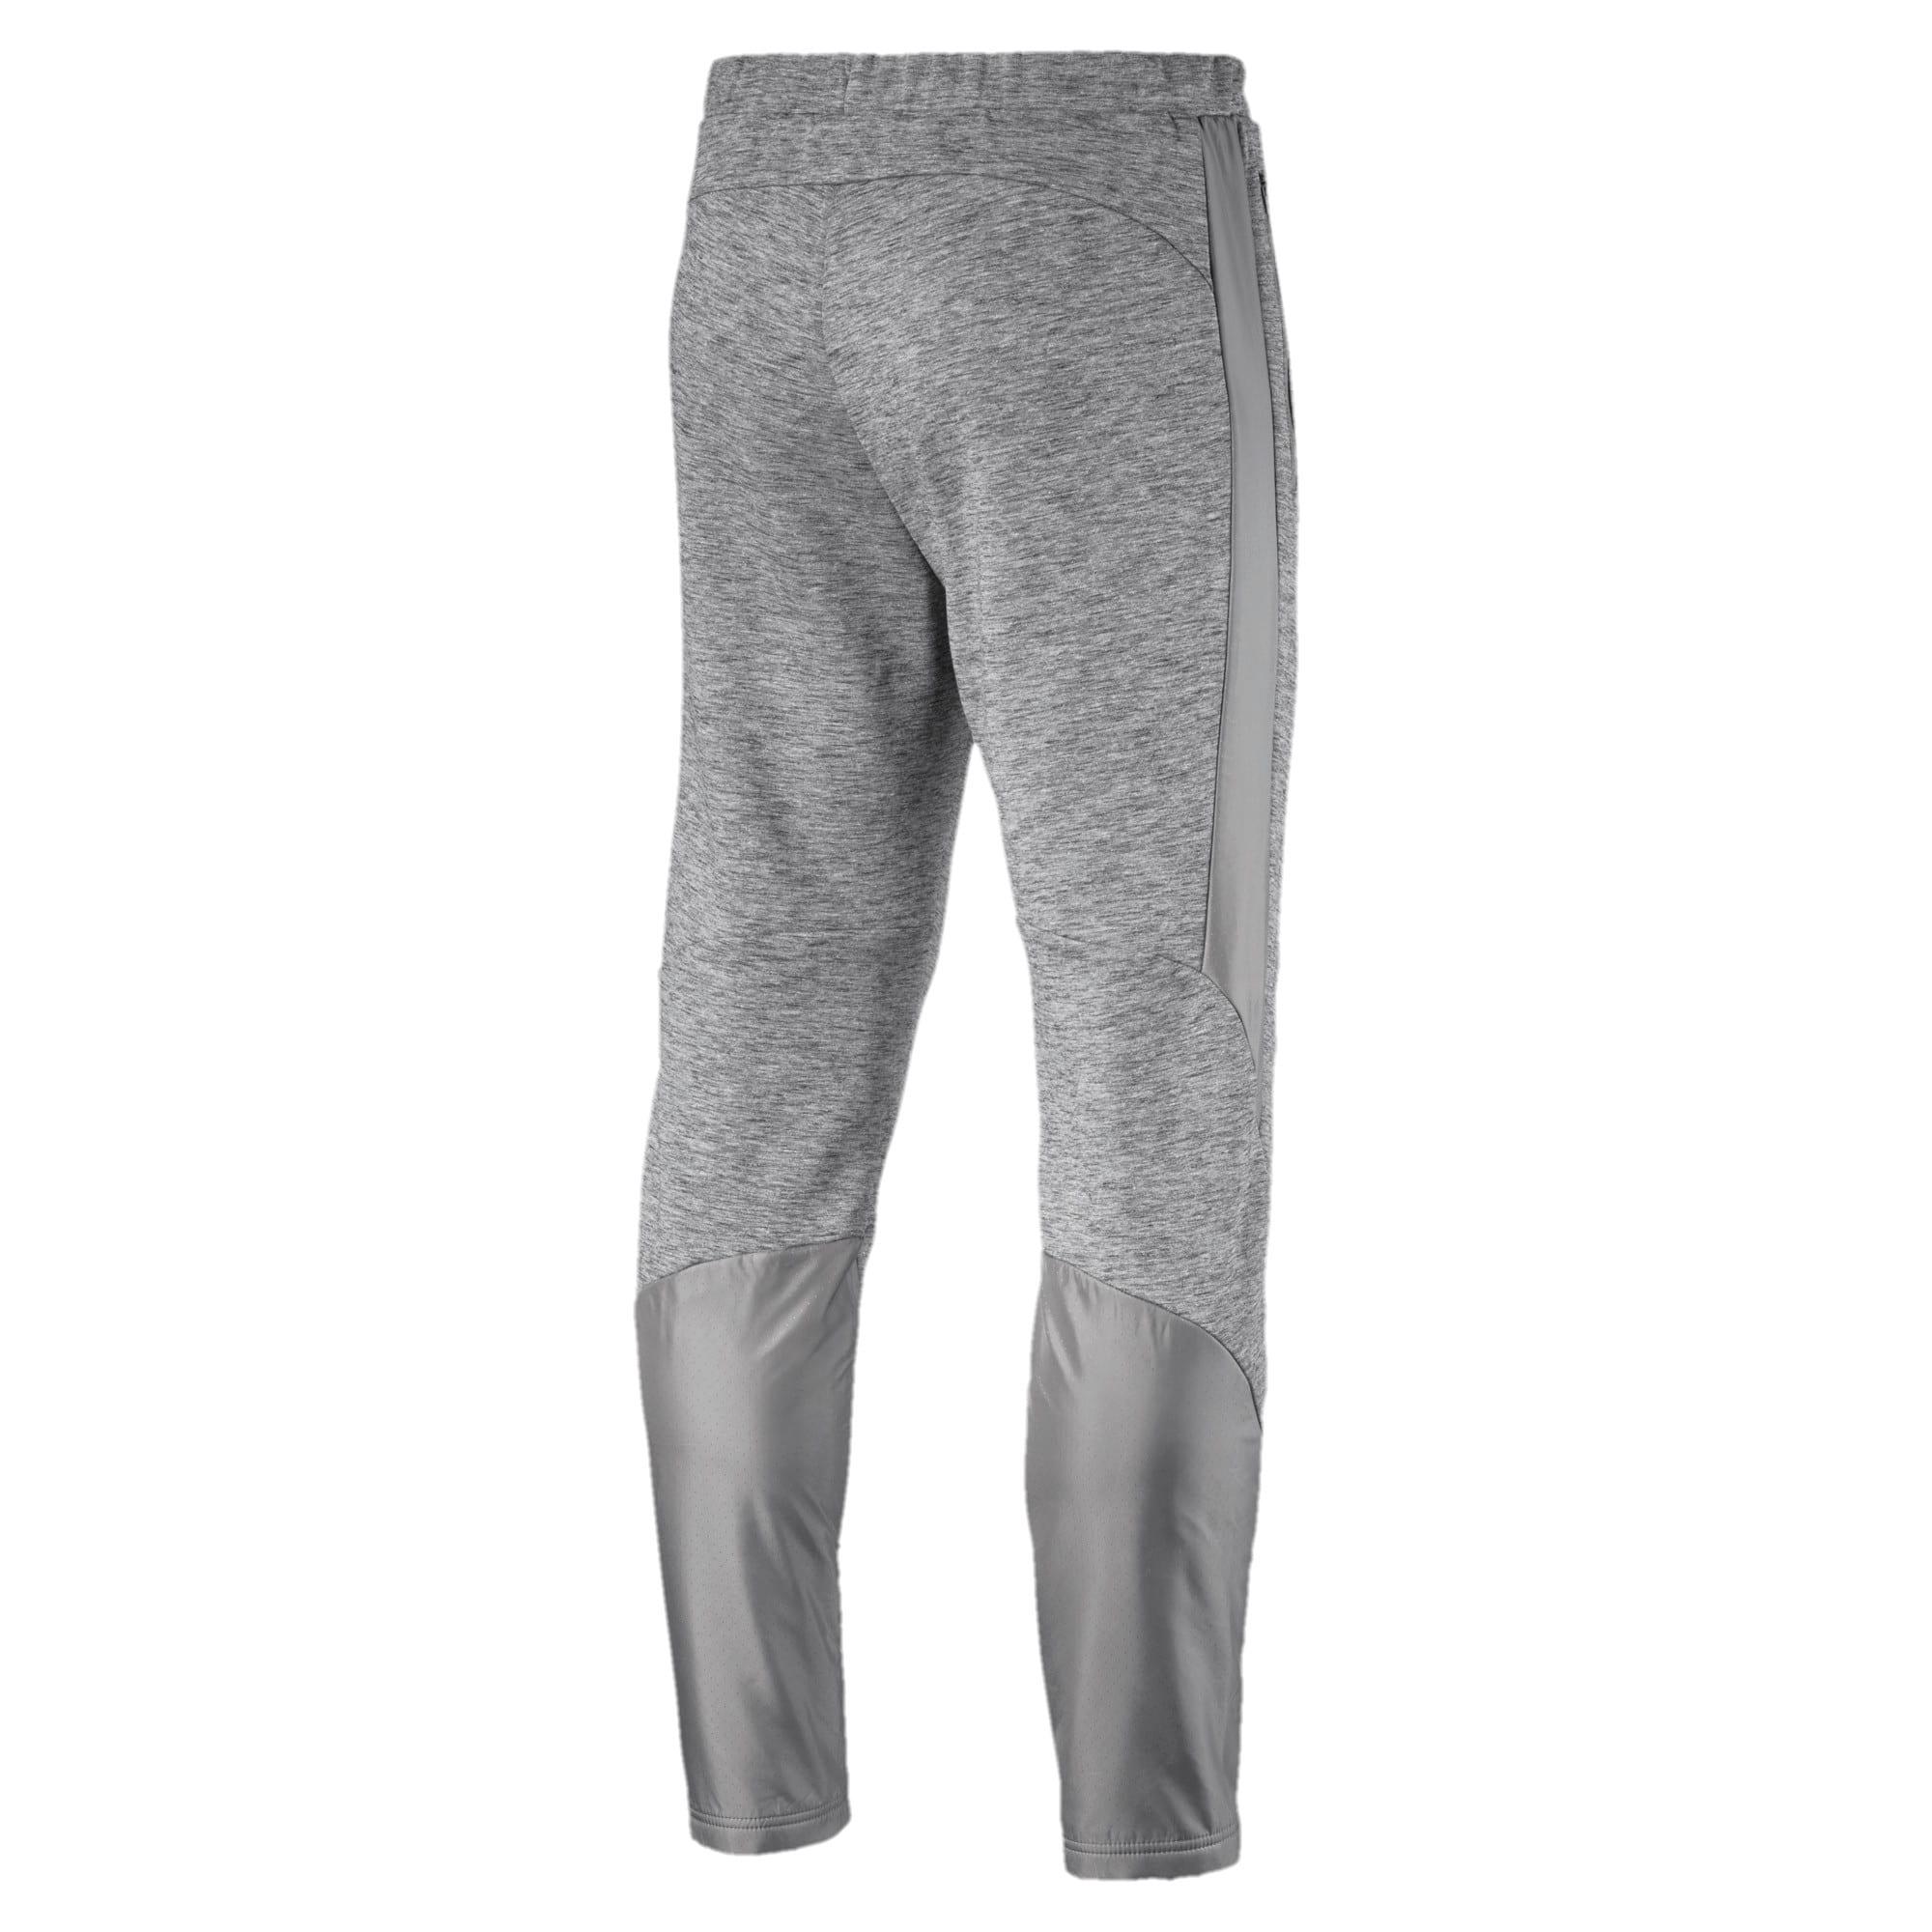 Thumbnail 3 of Active Men's Evostripe Water-Repellent Pants, Medium Gray Heather, medium